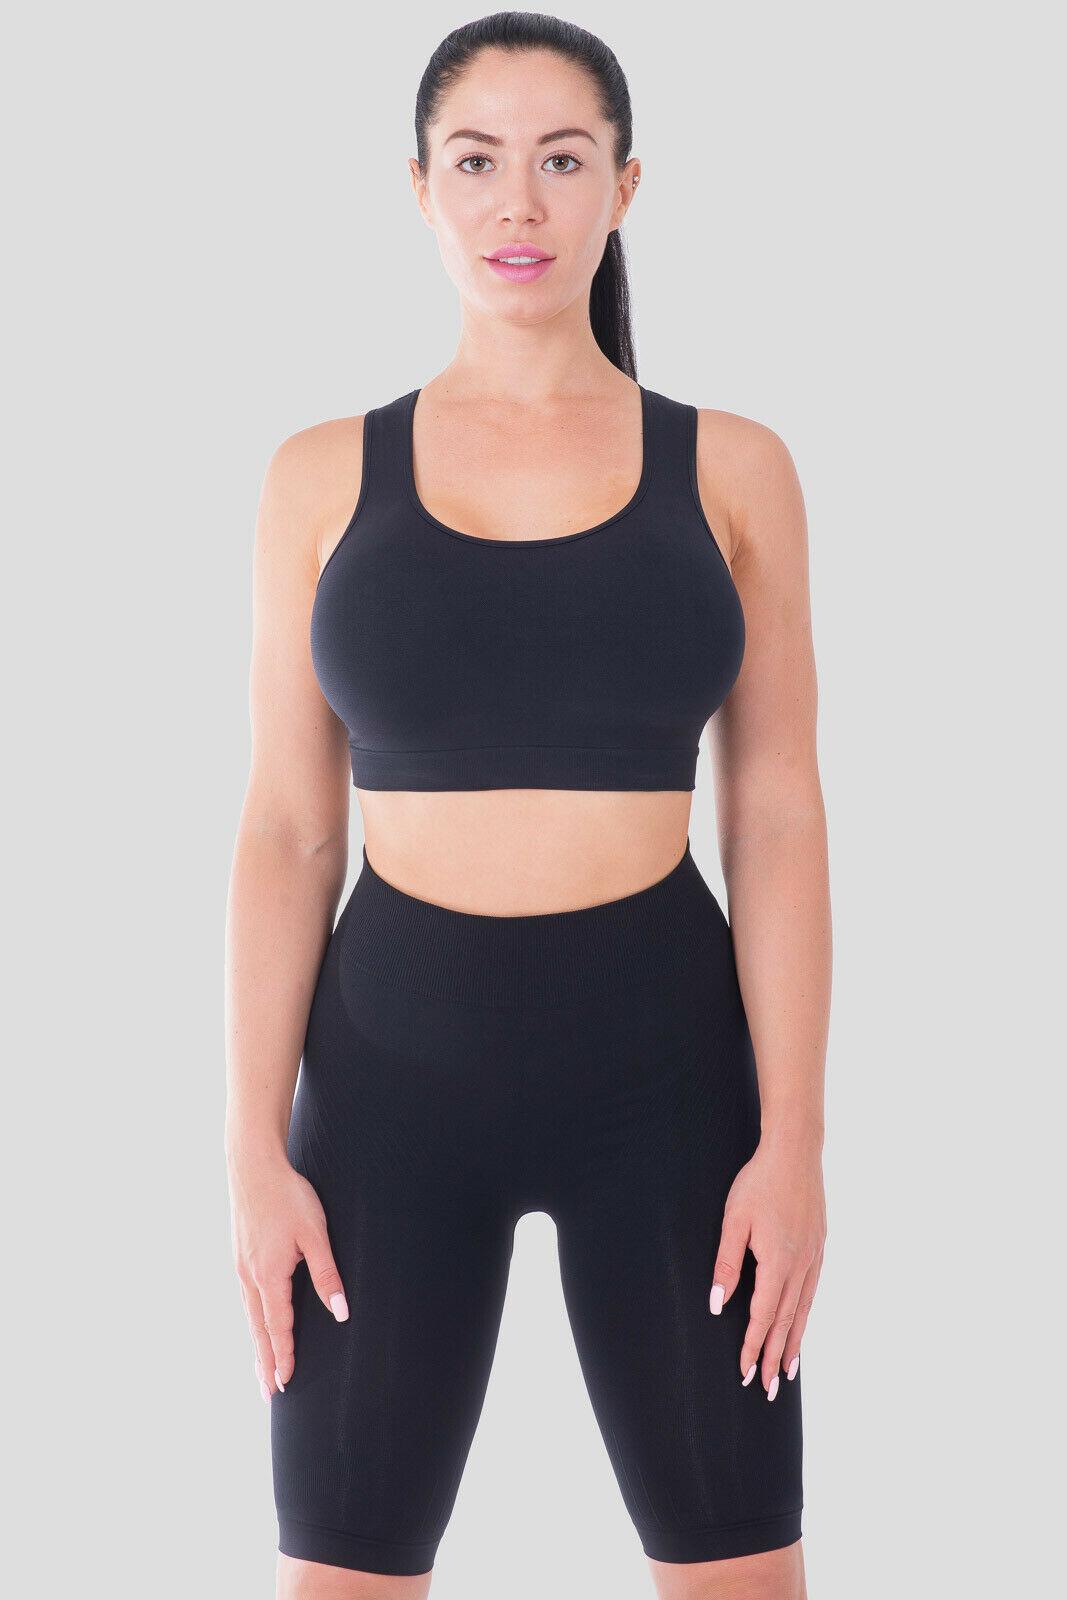 Bellissima-Women-039-s-Sport-Bra-Running-Yoga-Workout-Fitness-Racerback-Seamless thumbnail 20